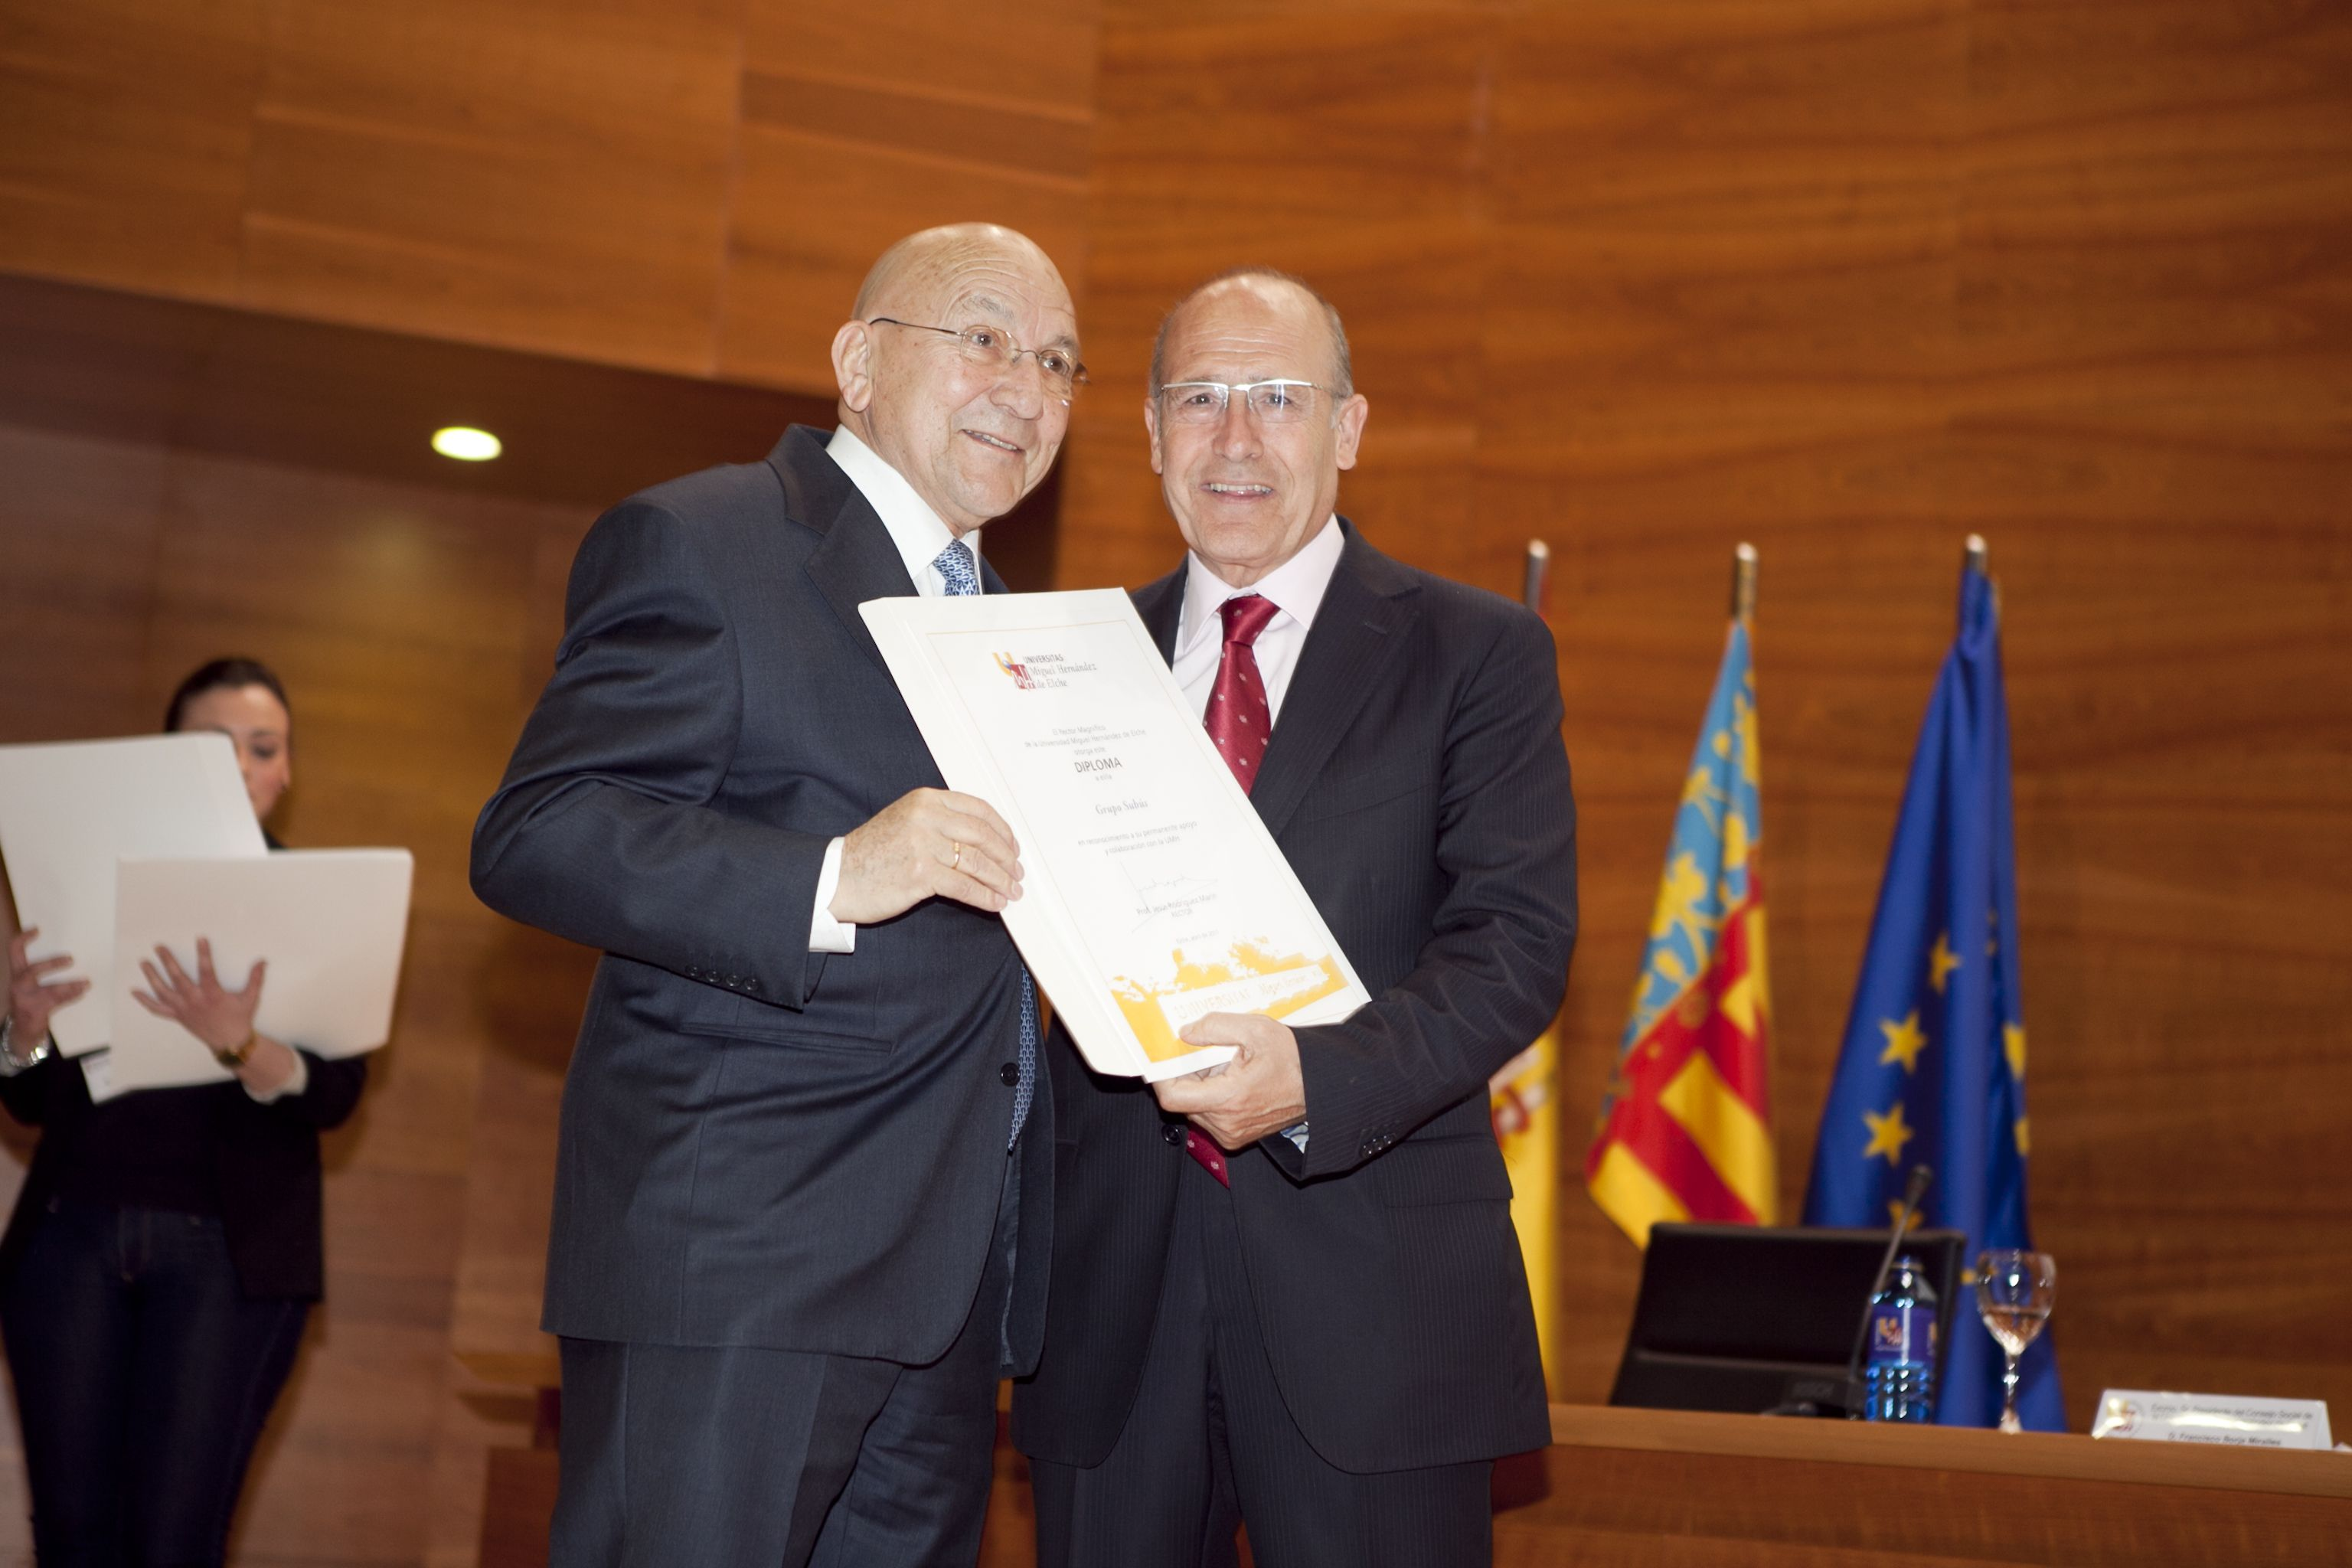 umh-diplomas-rector_mg_6764.jpg